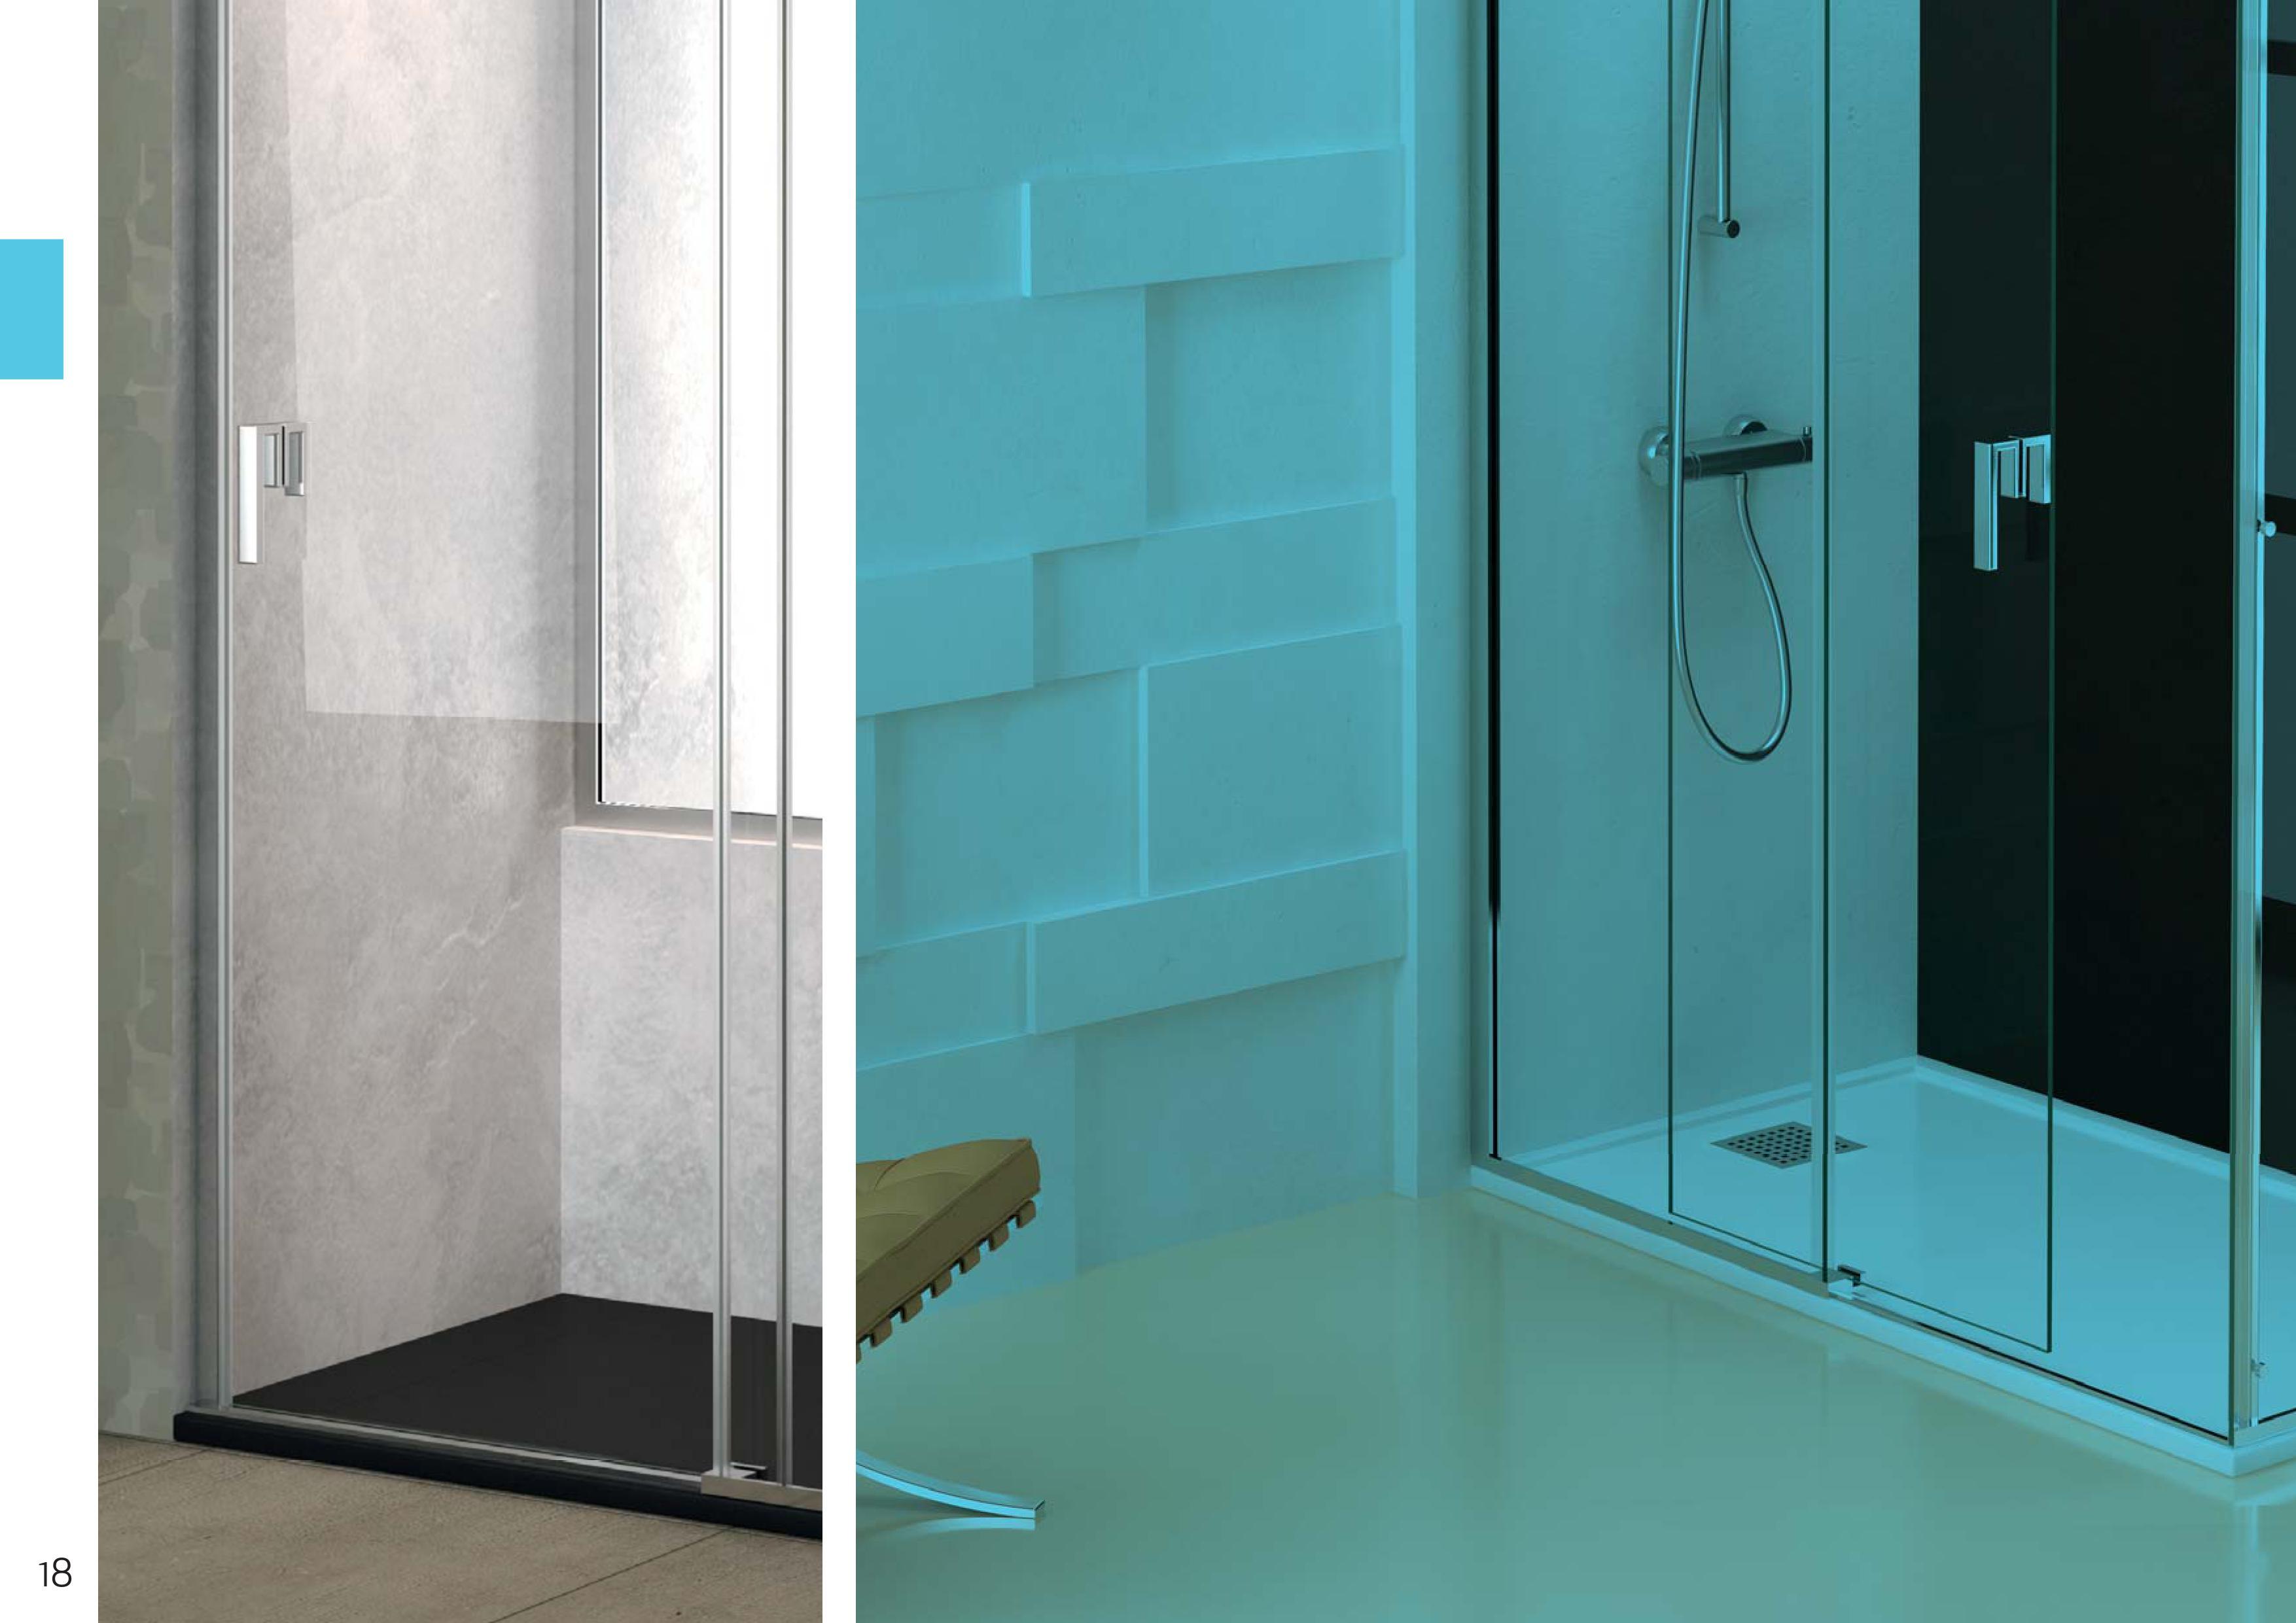 Serie ebro azulejos y pavimentos mart n for Azulejos y pavimentos san juan